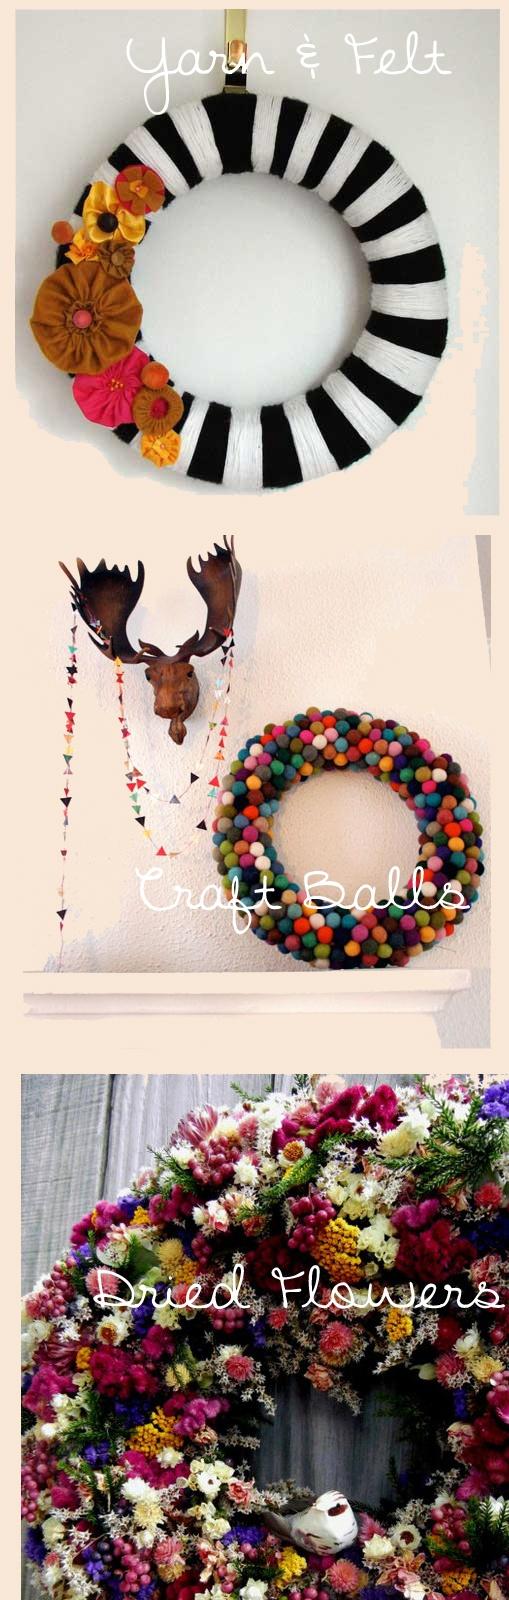 punk jewelry DIY wreaths